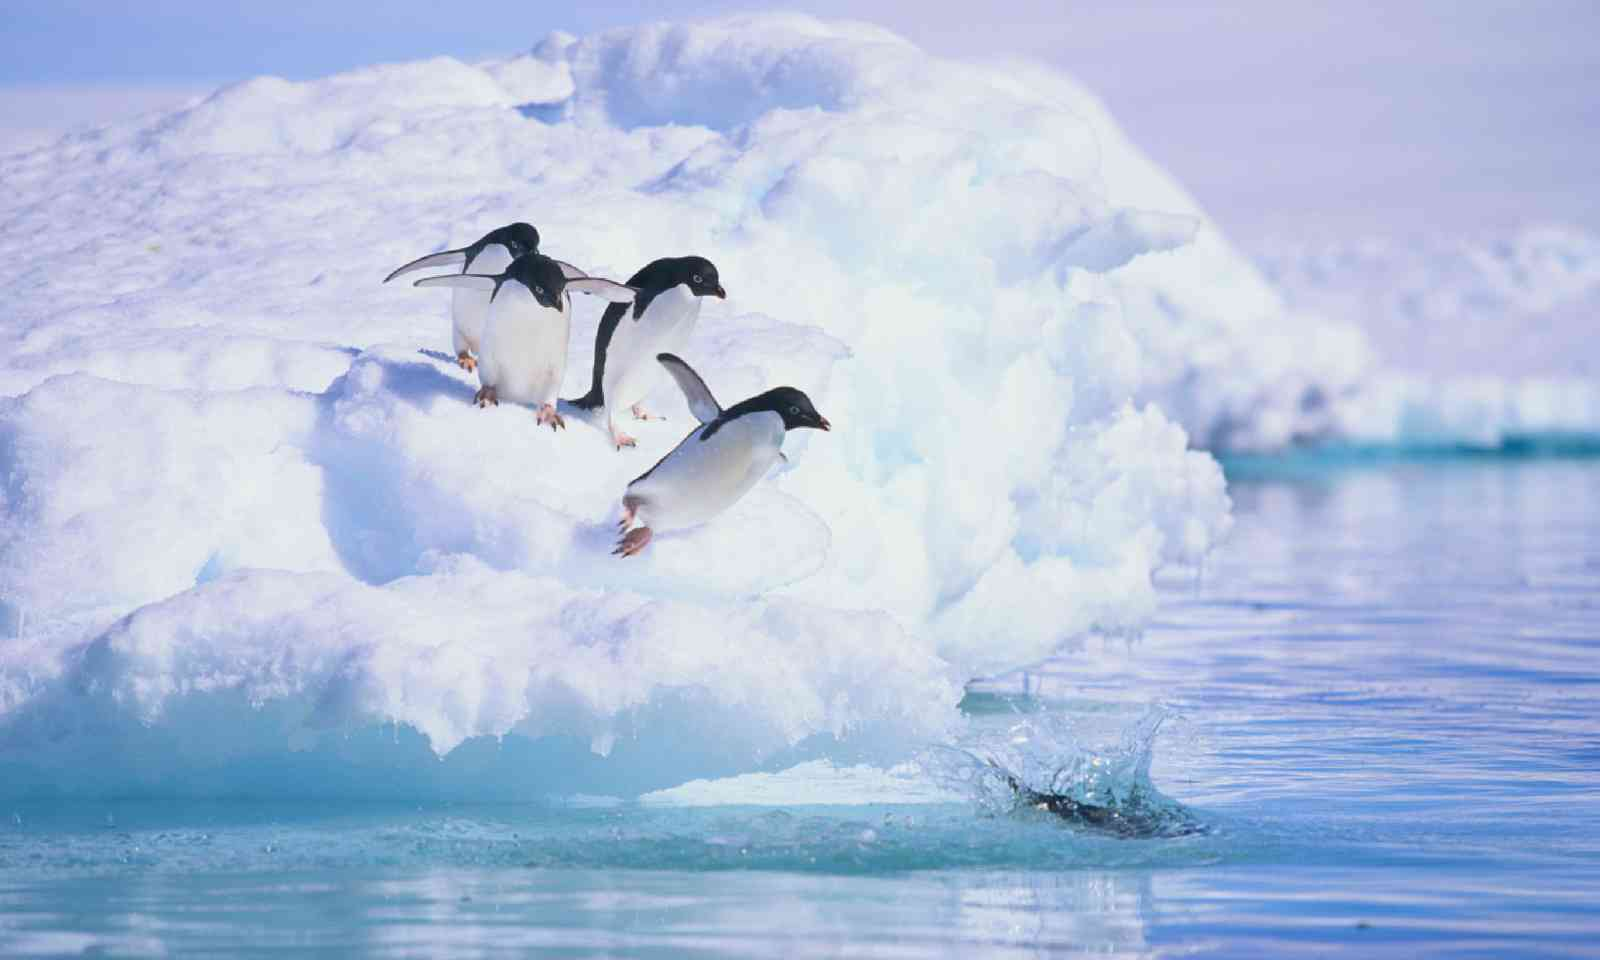 Adelie penguins (Shutterstock)